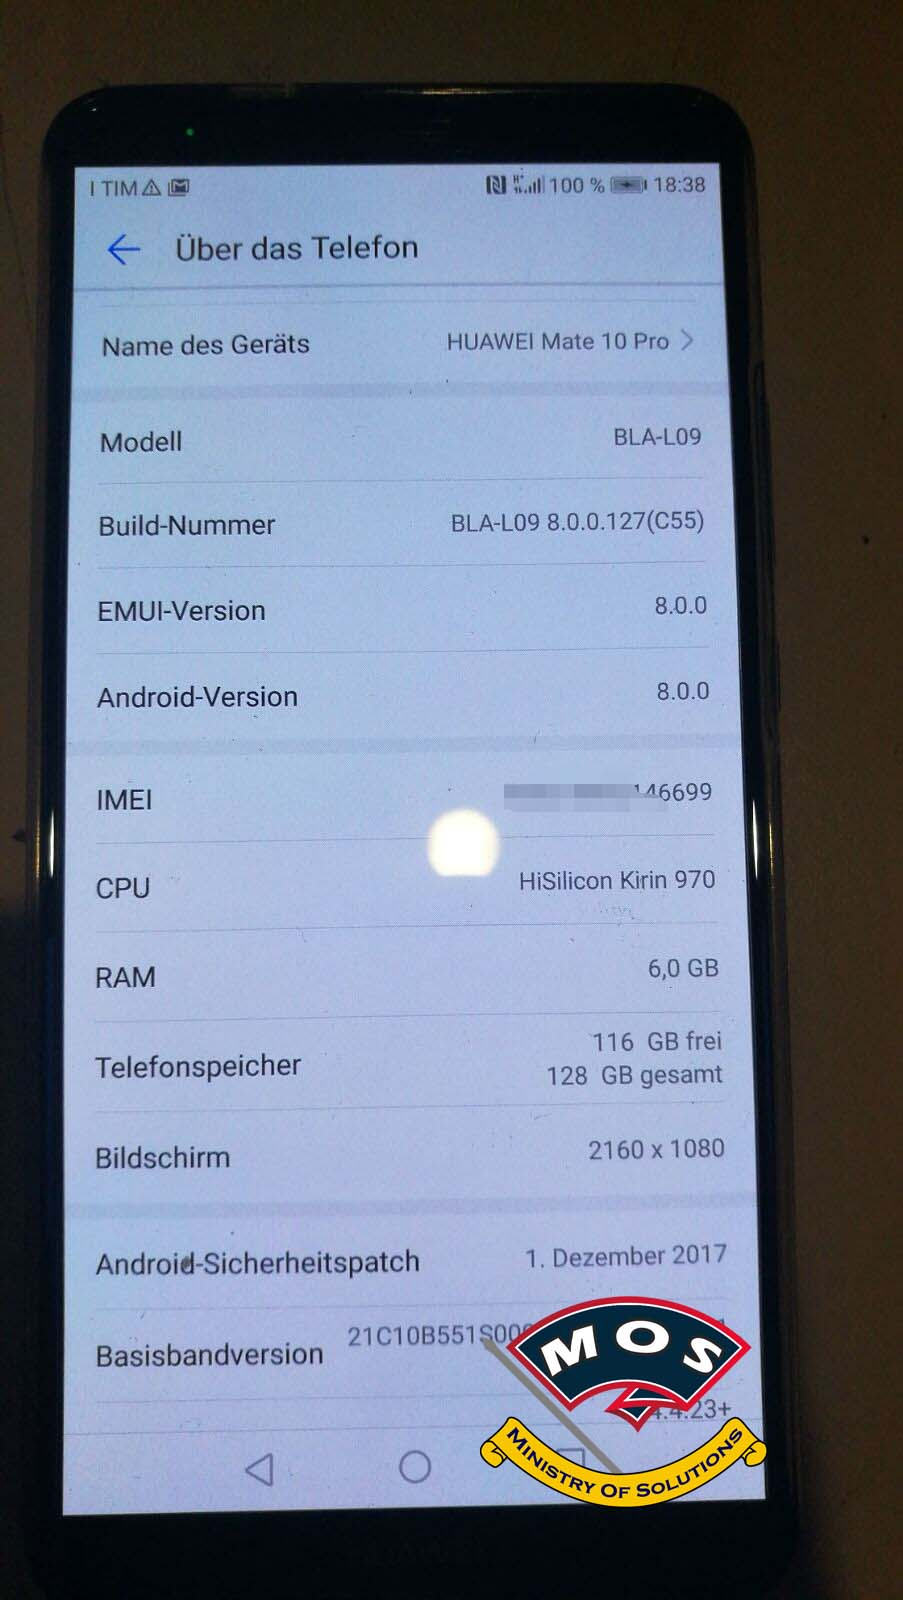 Huawei Mate 10 Pro Rebranding (Convert to Dual Sim)(Chinese